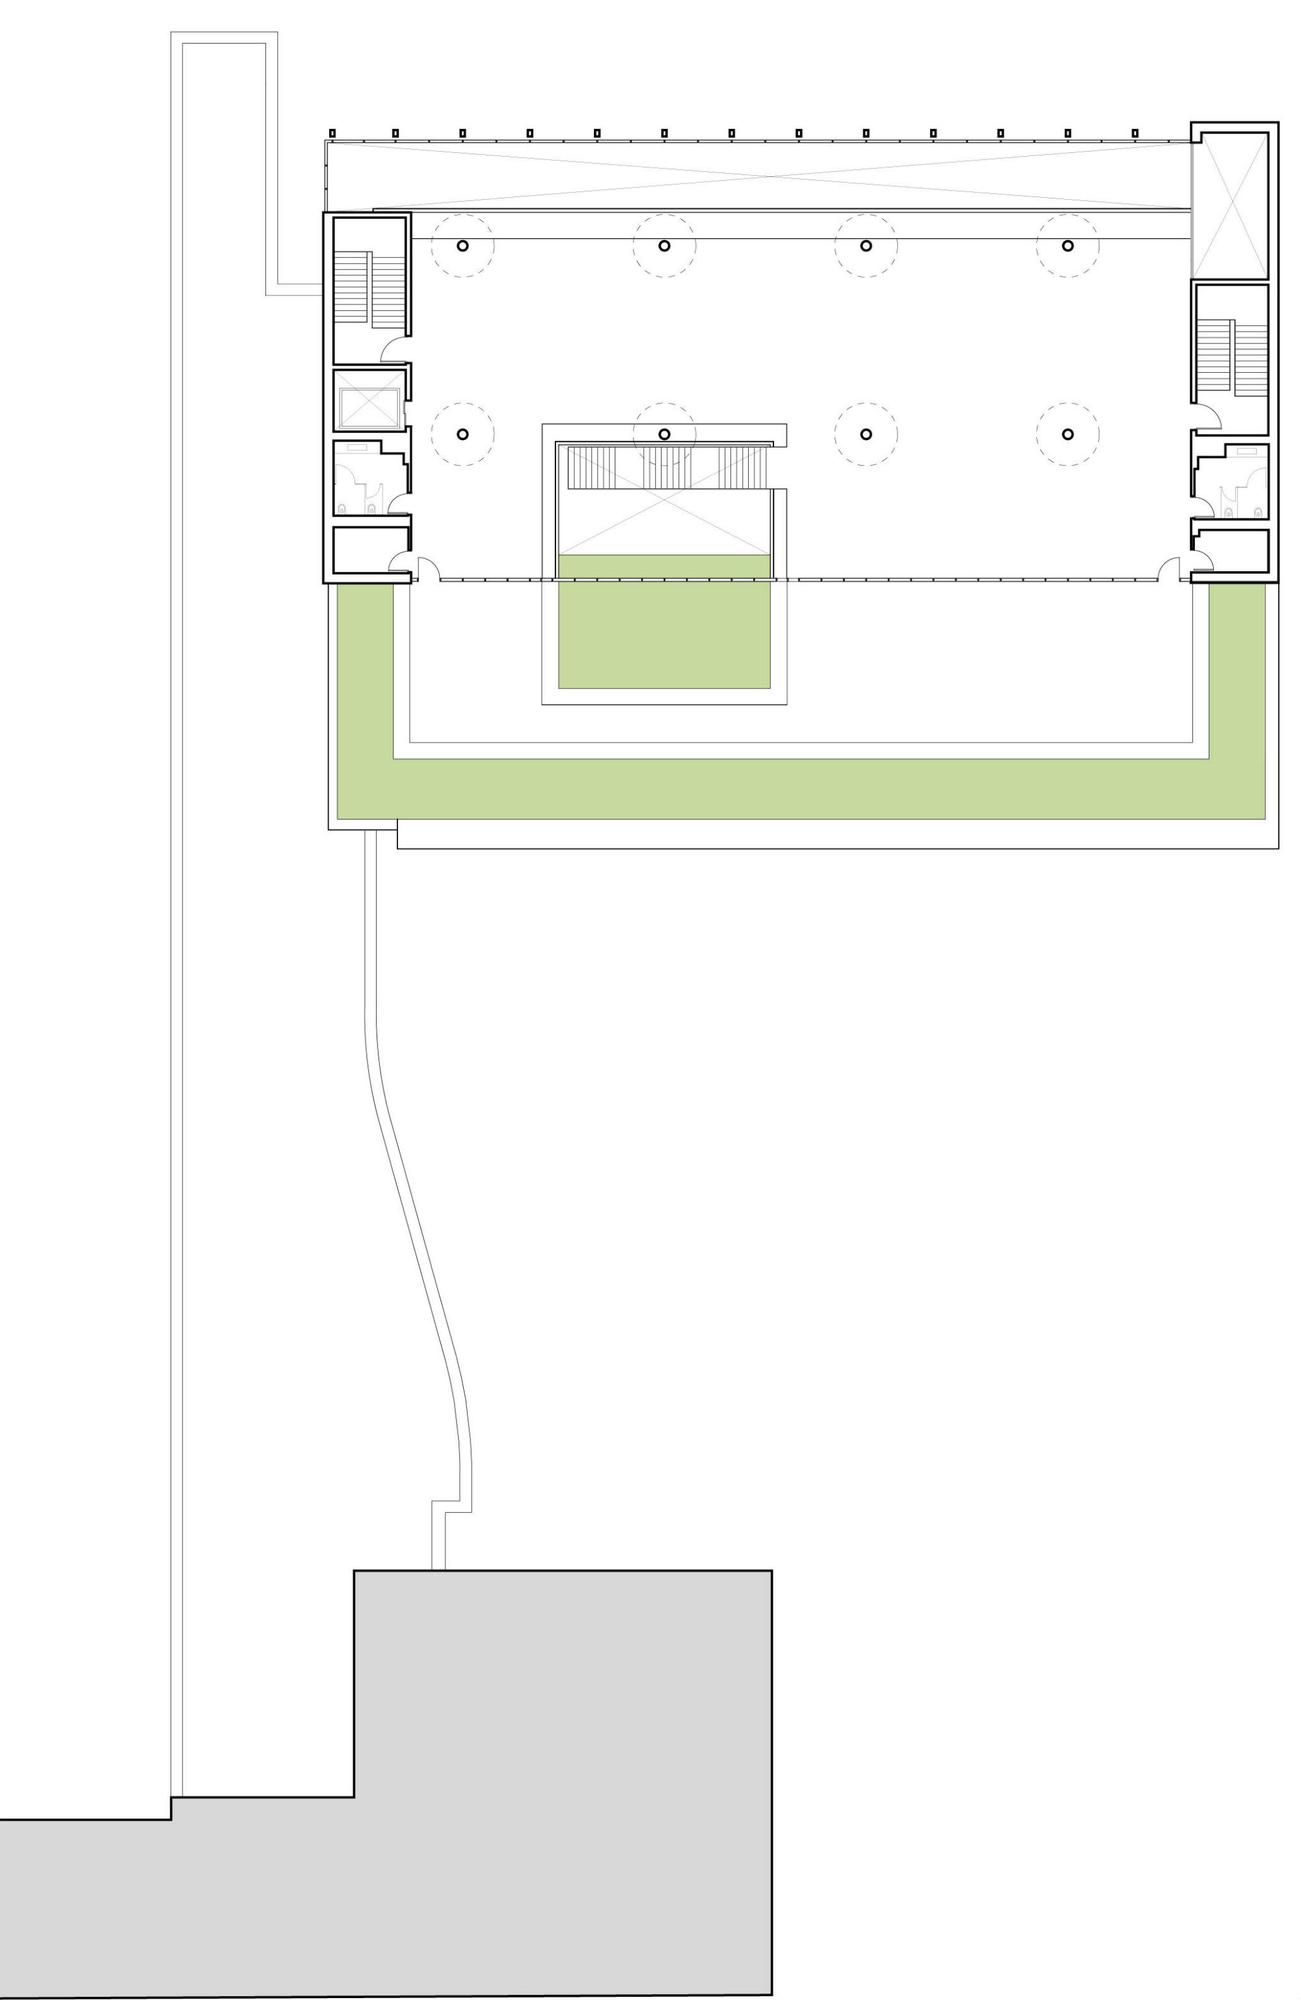 Mohawk College Floor Plan Choice Image Home Fixtures